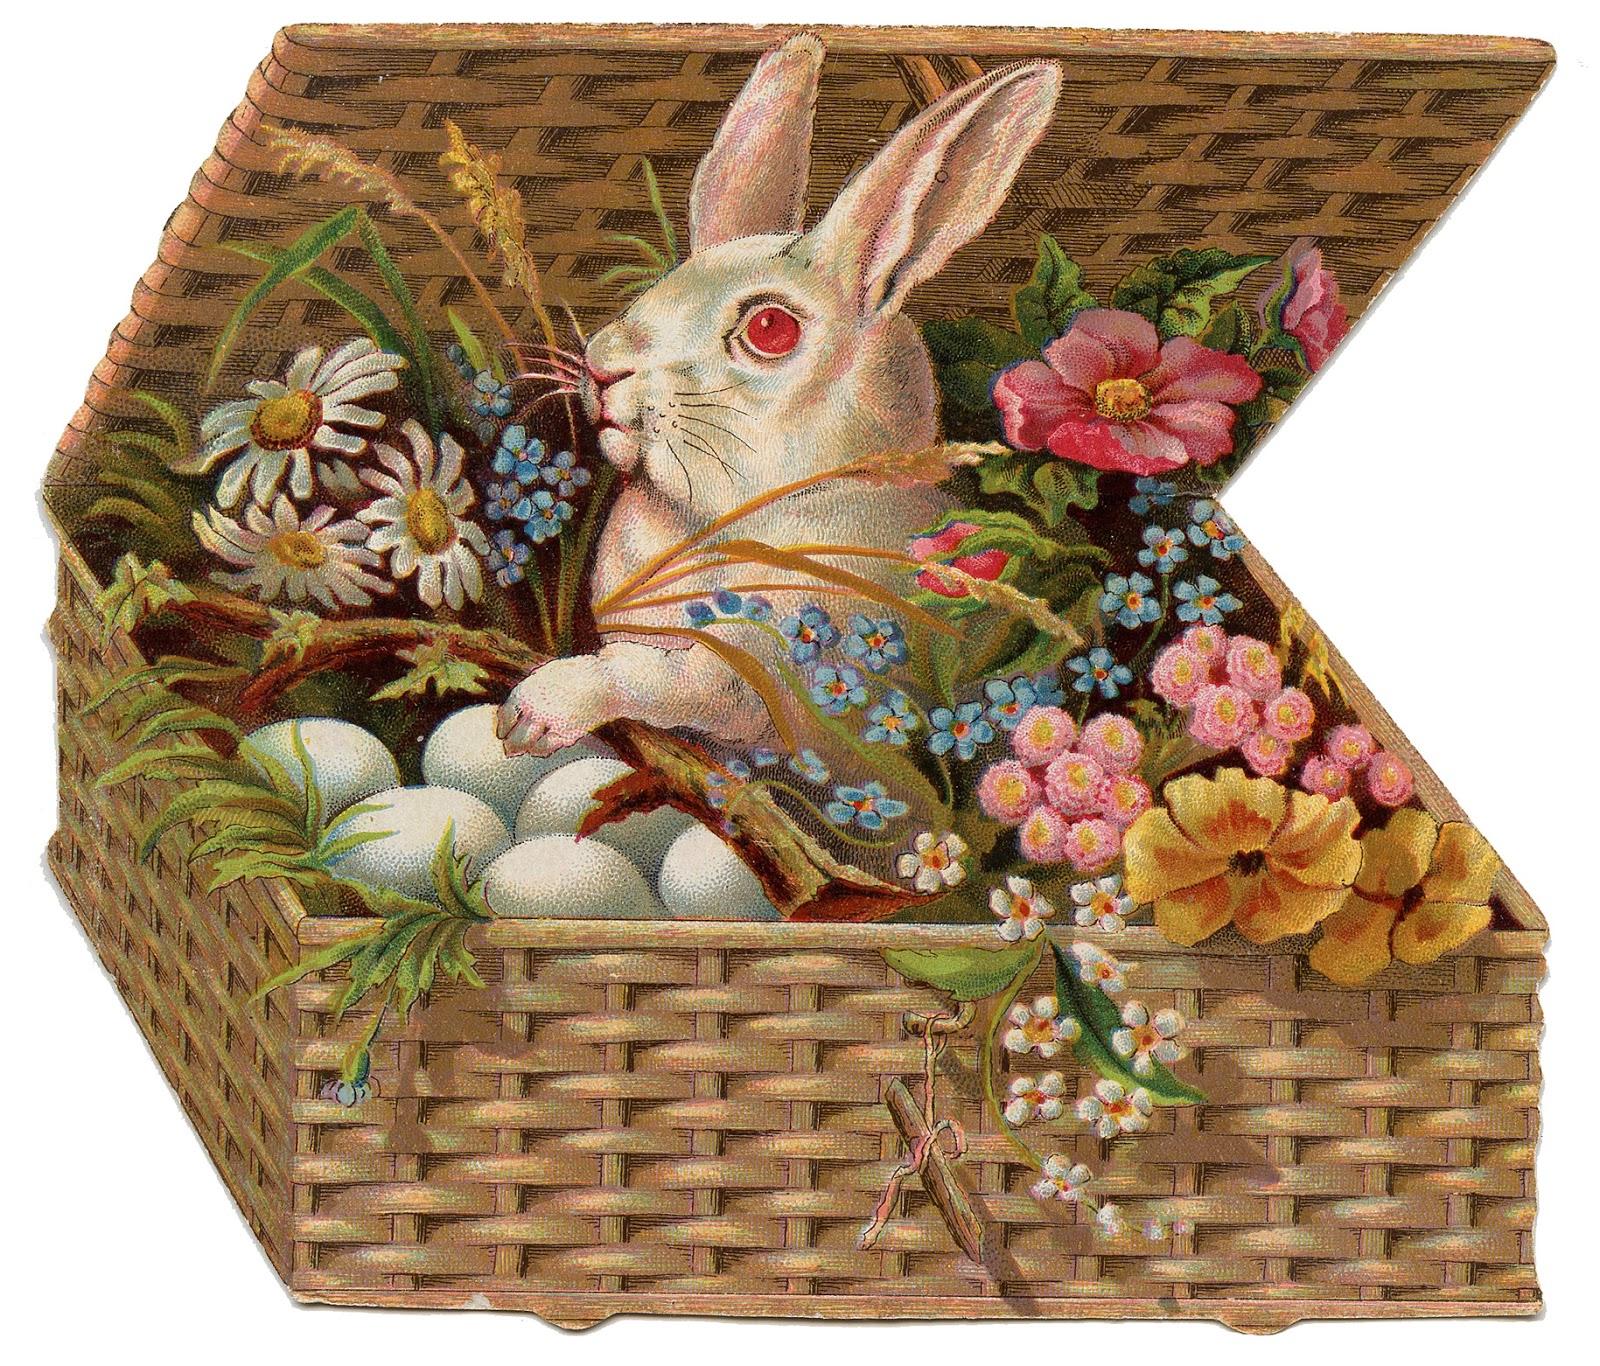 Vintage easter egg images clipart banner library download 17 Best images about Vintage Graphics on Pinterest | Easter ... banner library download